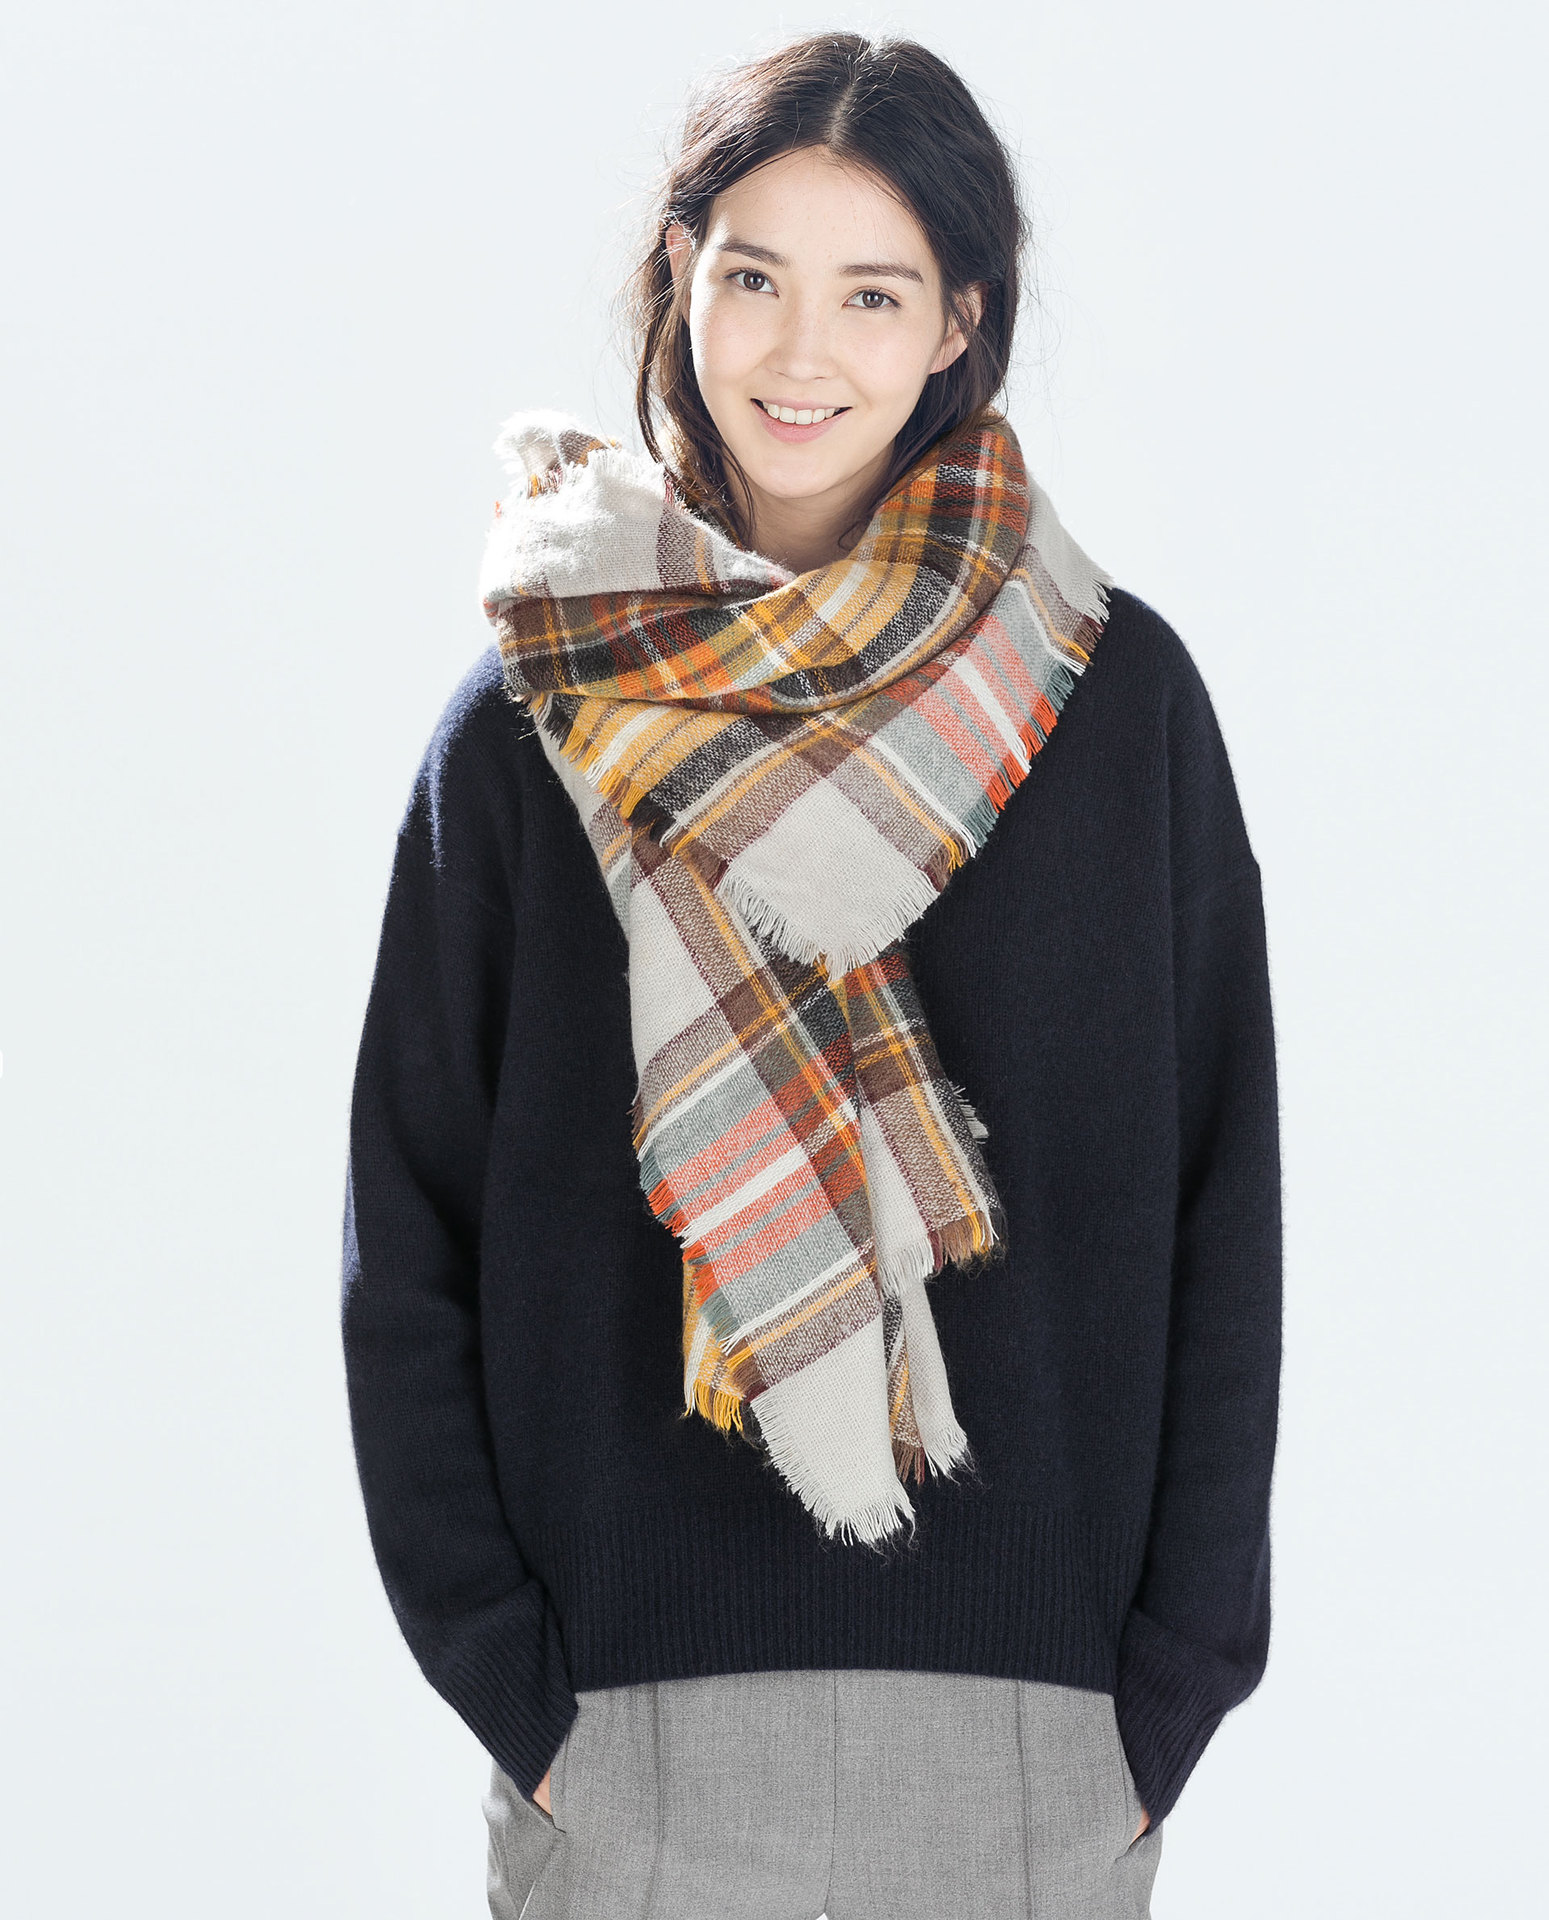 minorista online 04f51 0faf2 Details about zara Yellow Orange Winter Blanket Scarf Bufandas Mujer Warm  Soft Pashmina Wrap